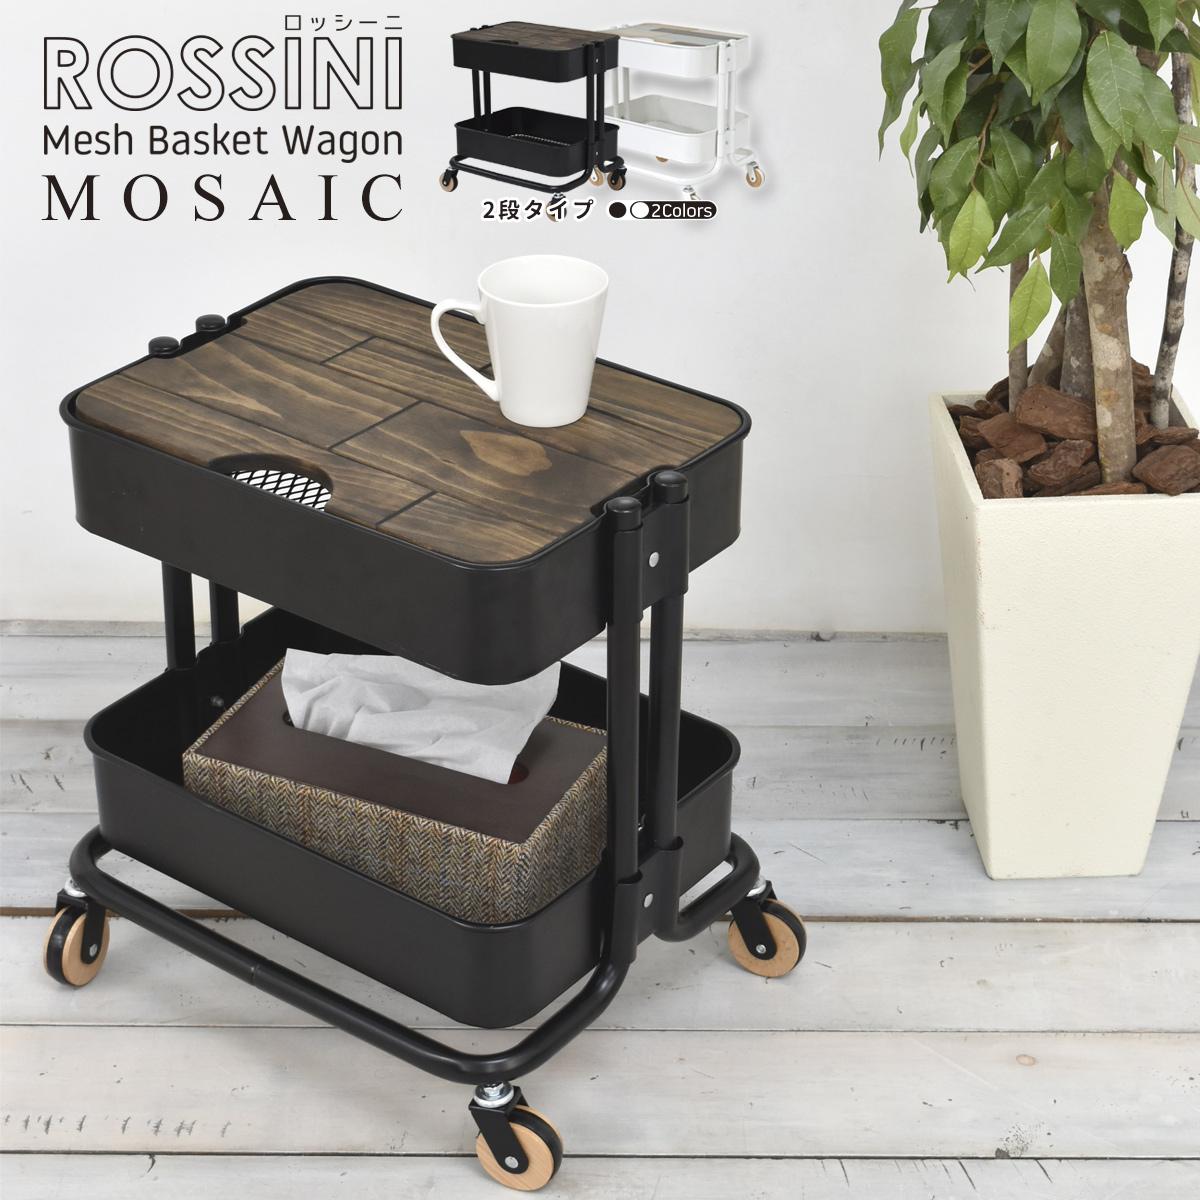 ROSSINI メッシュバスケットワゴン 2段 モザイク